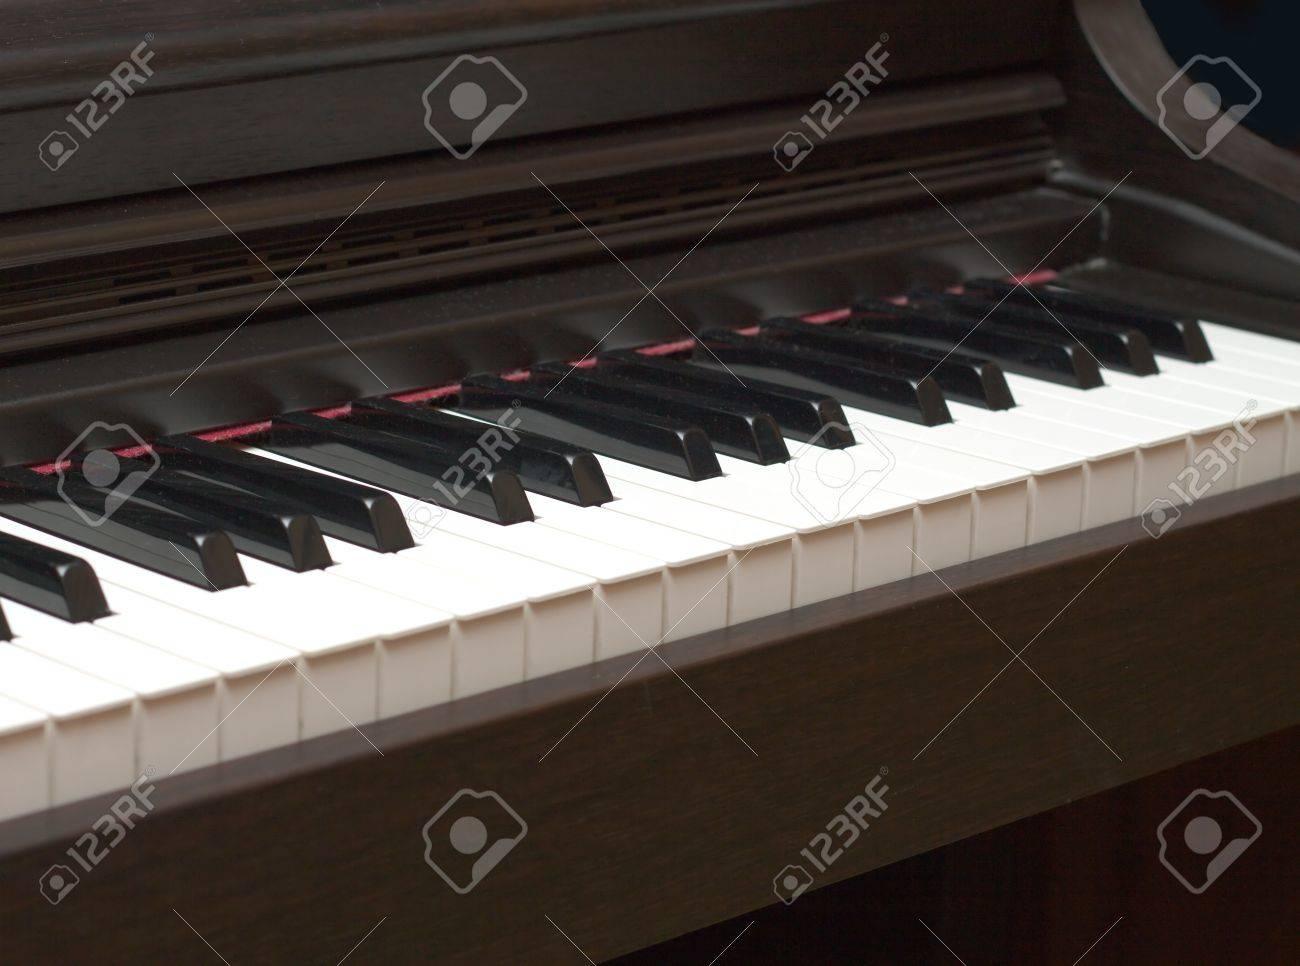 Piano keys closeup diagonal view Stock Photo - 16708697